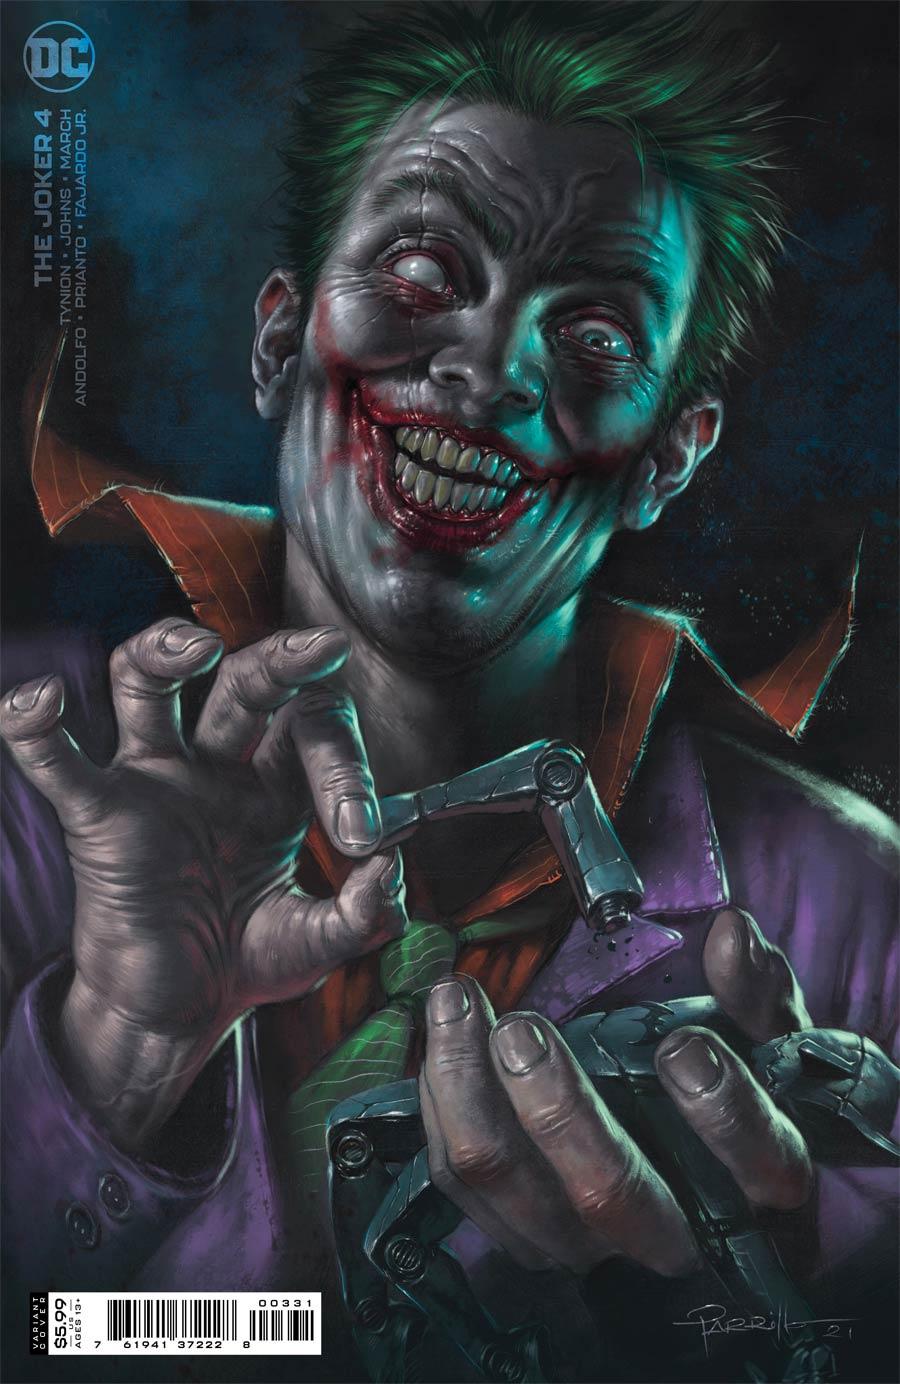 Joker Vol 2 #4 Cover B Variant Lucio Parrillo Cover